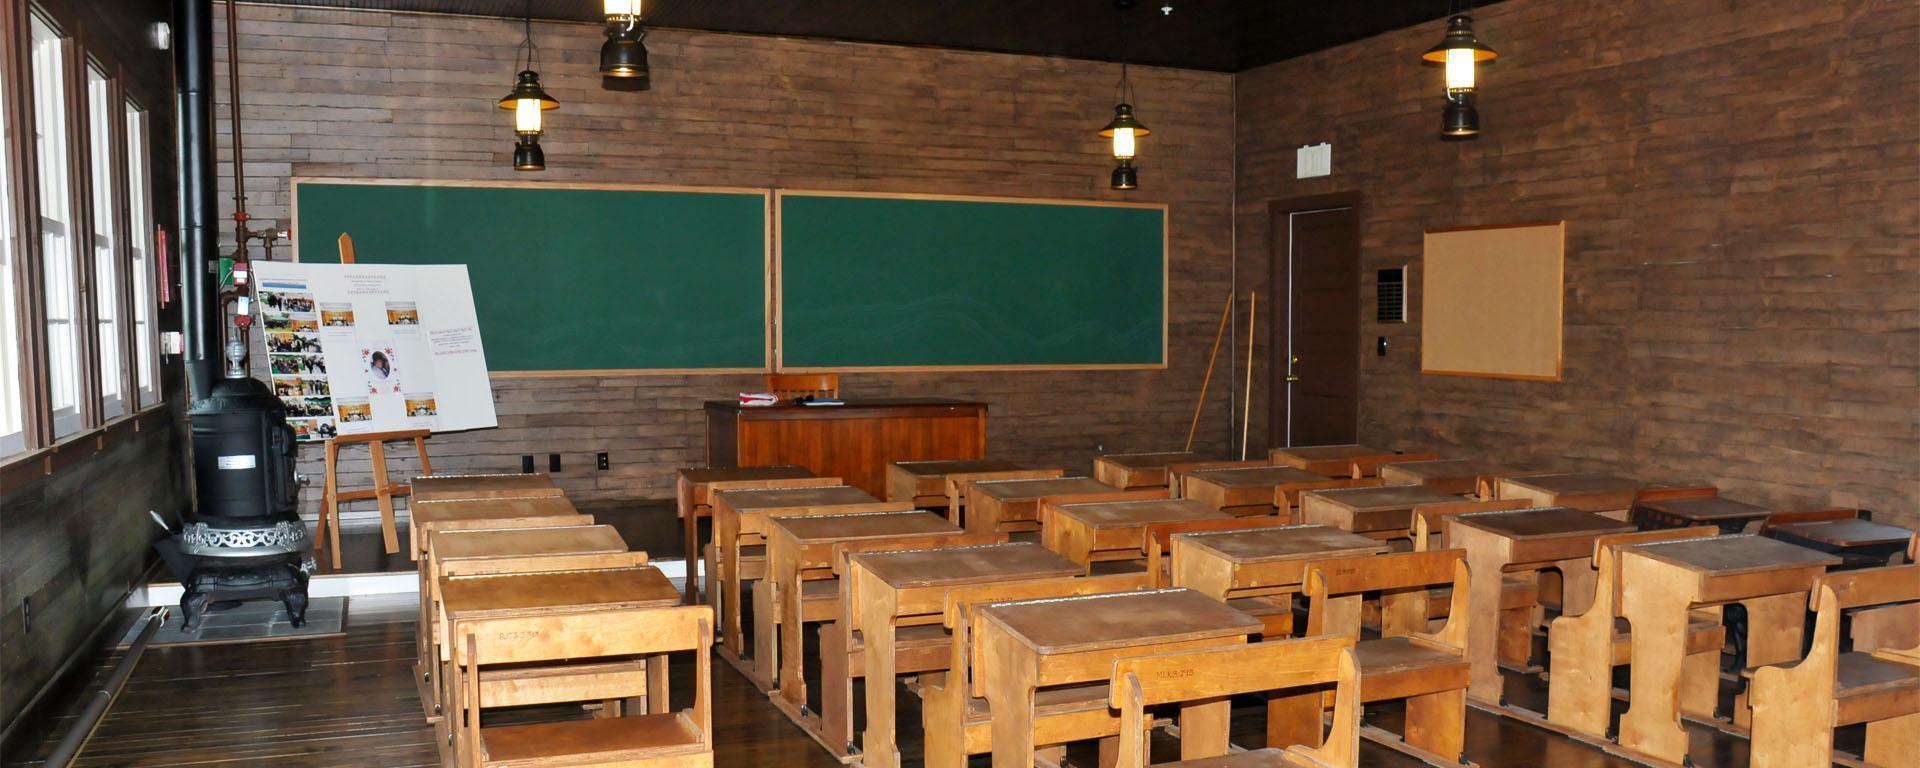 New Monrovia Schoolhouse